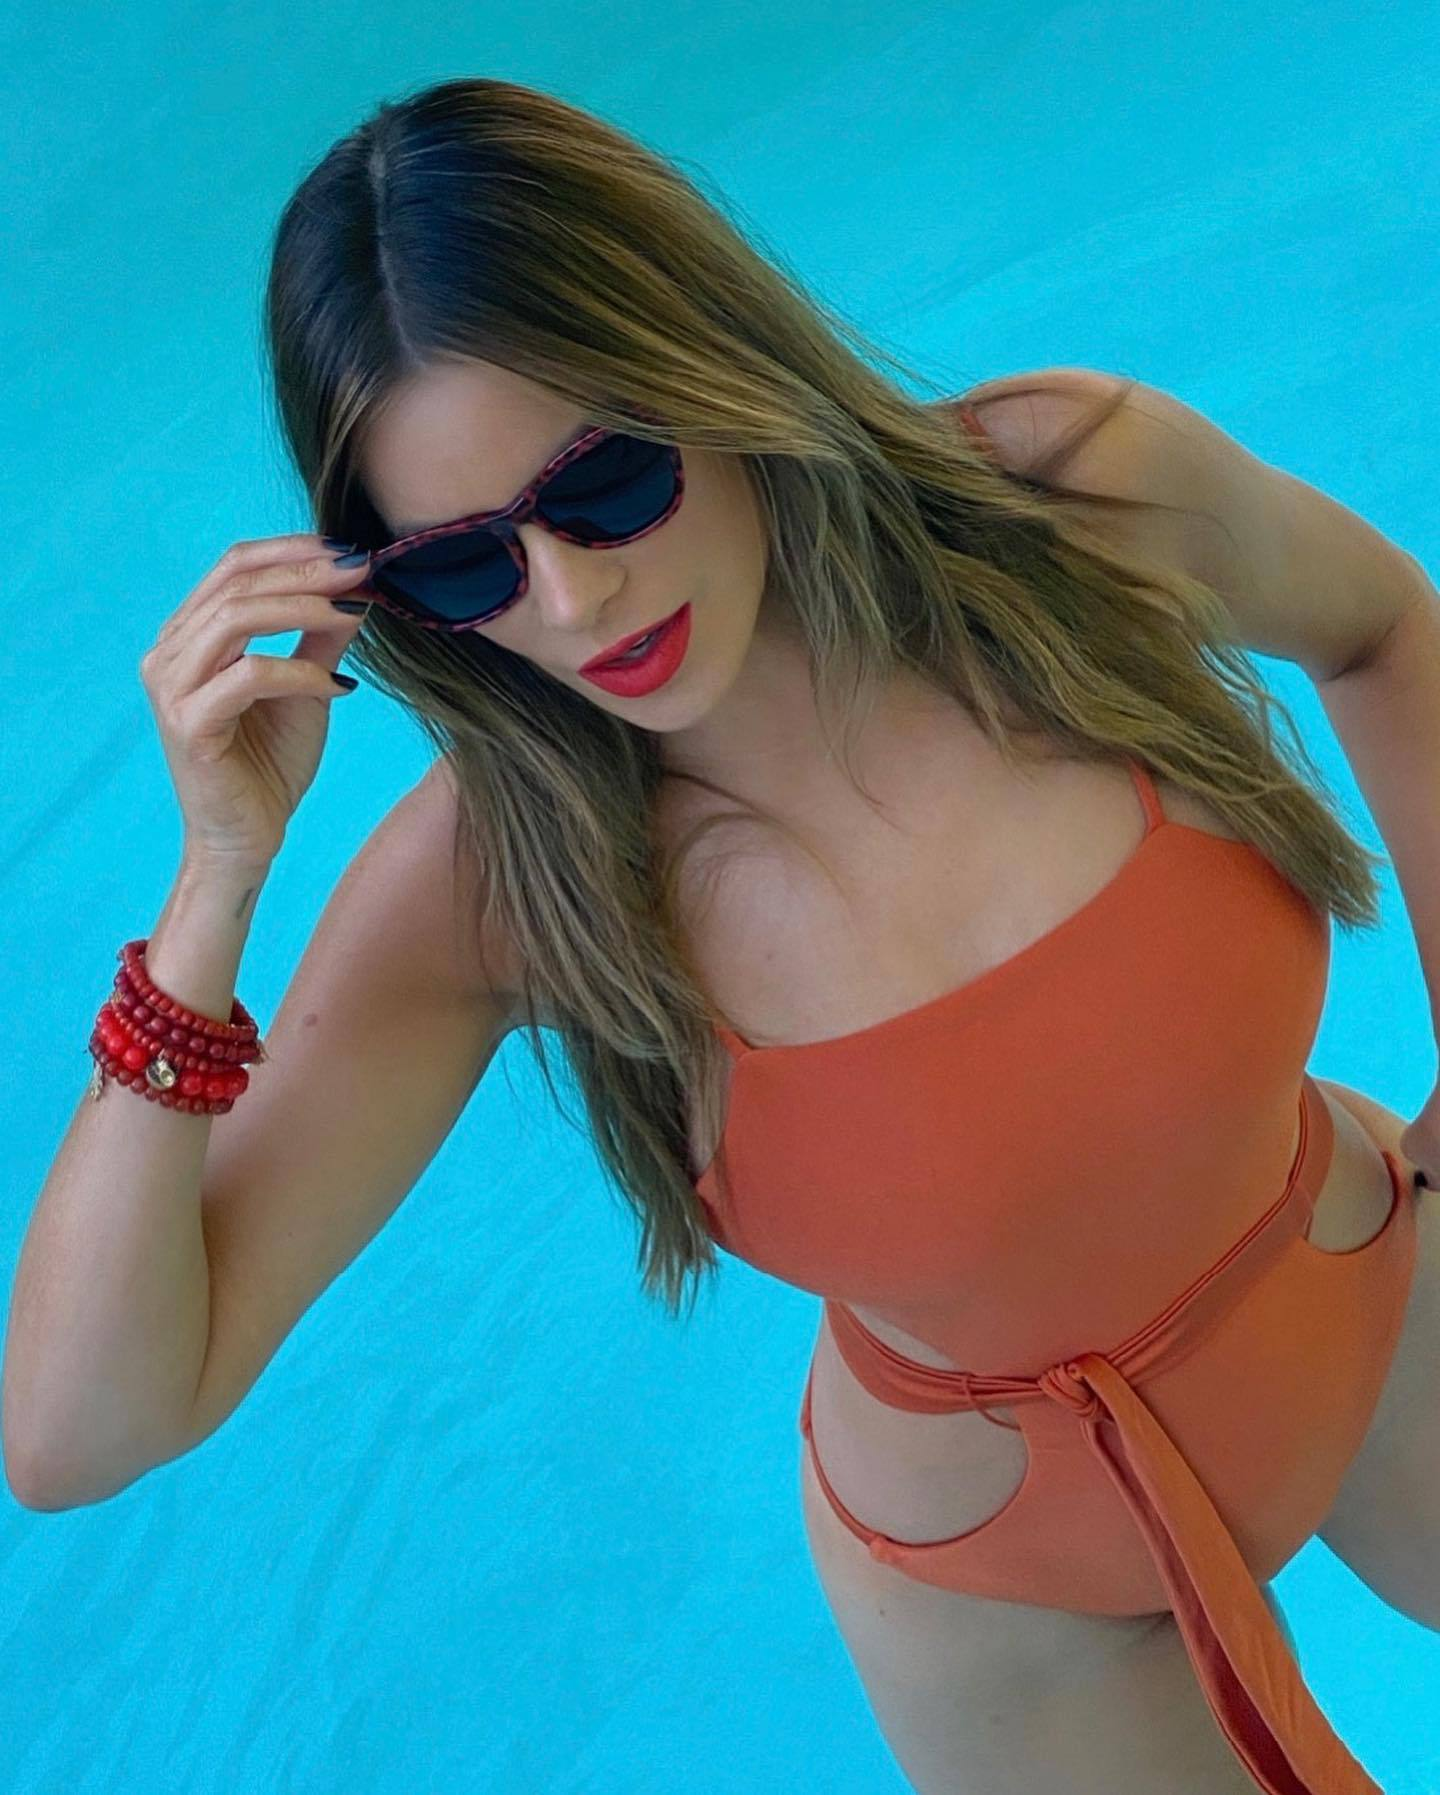 Sofia Vergara Hot Body In Swimsuit